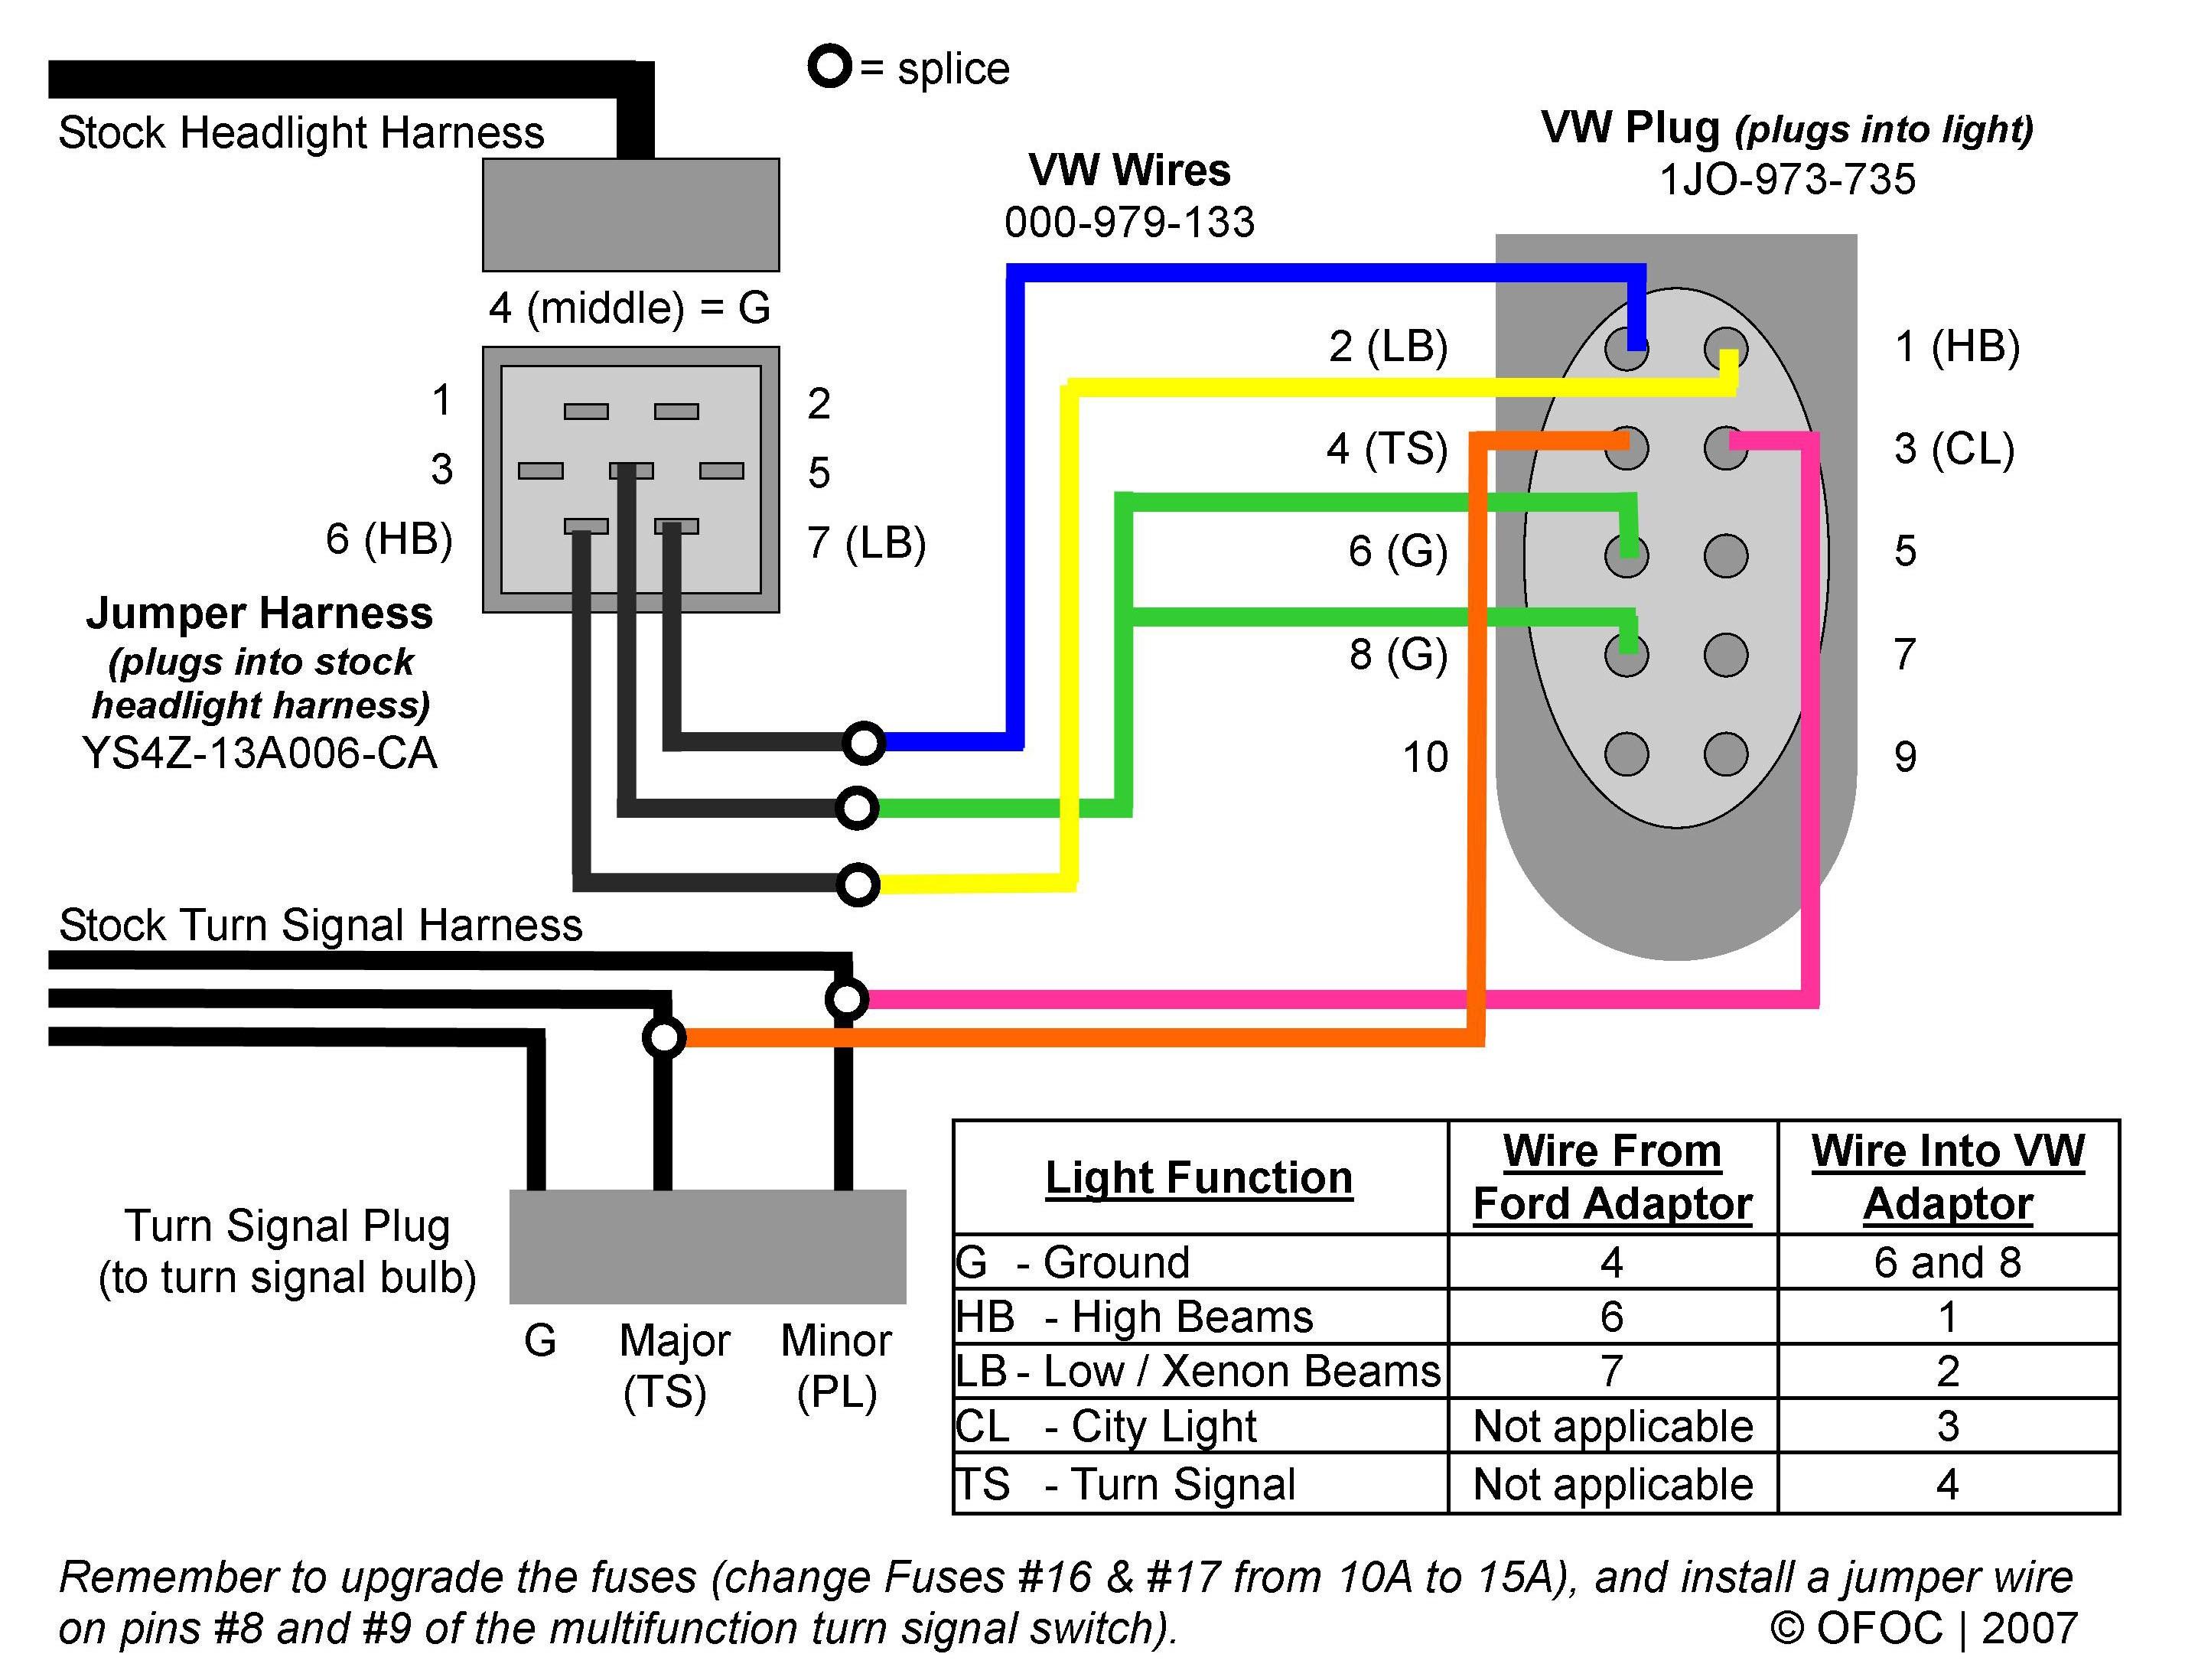 2006 Vw Jetta Radio Wiring Diagram Harley Davidson Cl 1 Diagrams Of